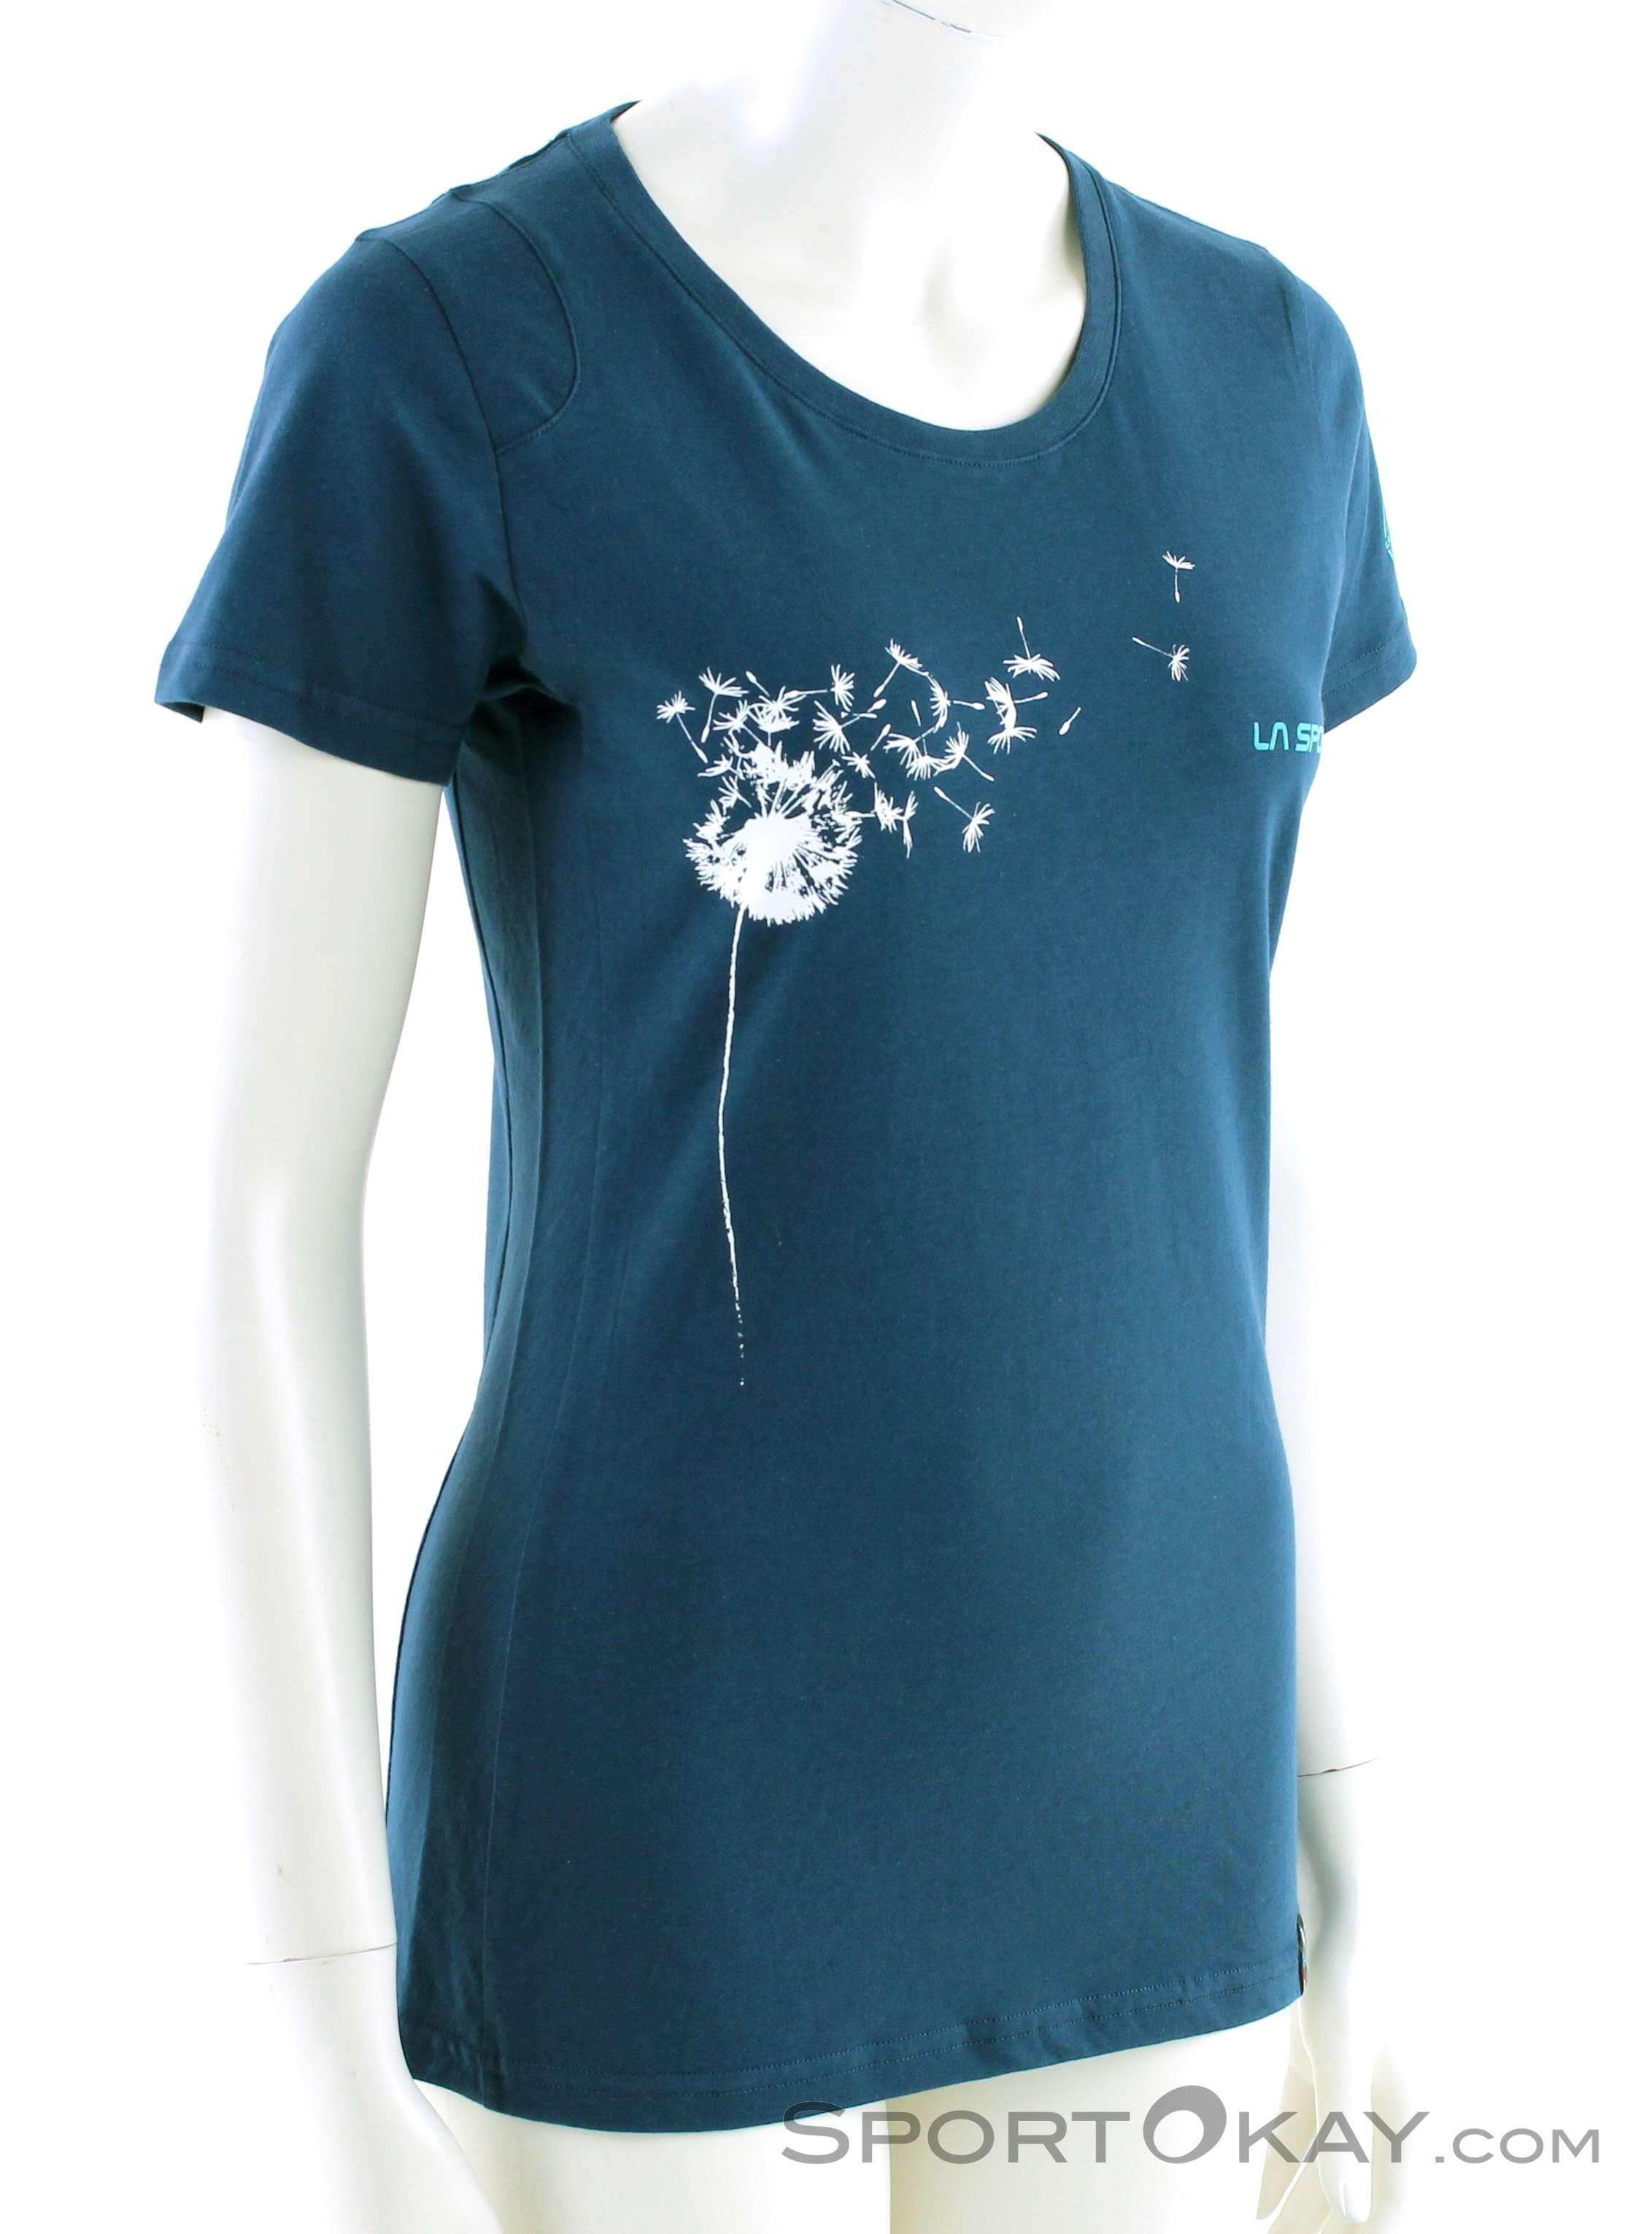 5db82f5e003 La Sportiva Windy Womens T-Shirt - Shirts & T-Shirts - Outdoor ...